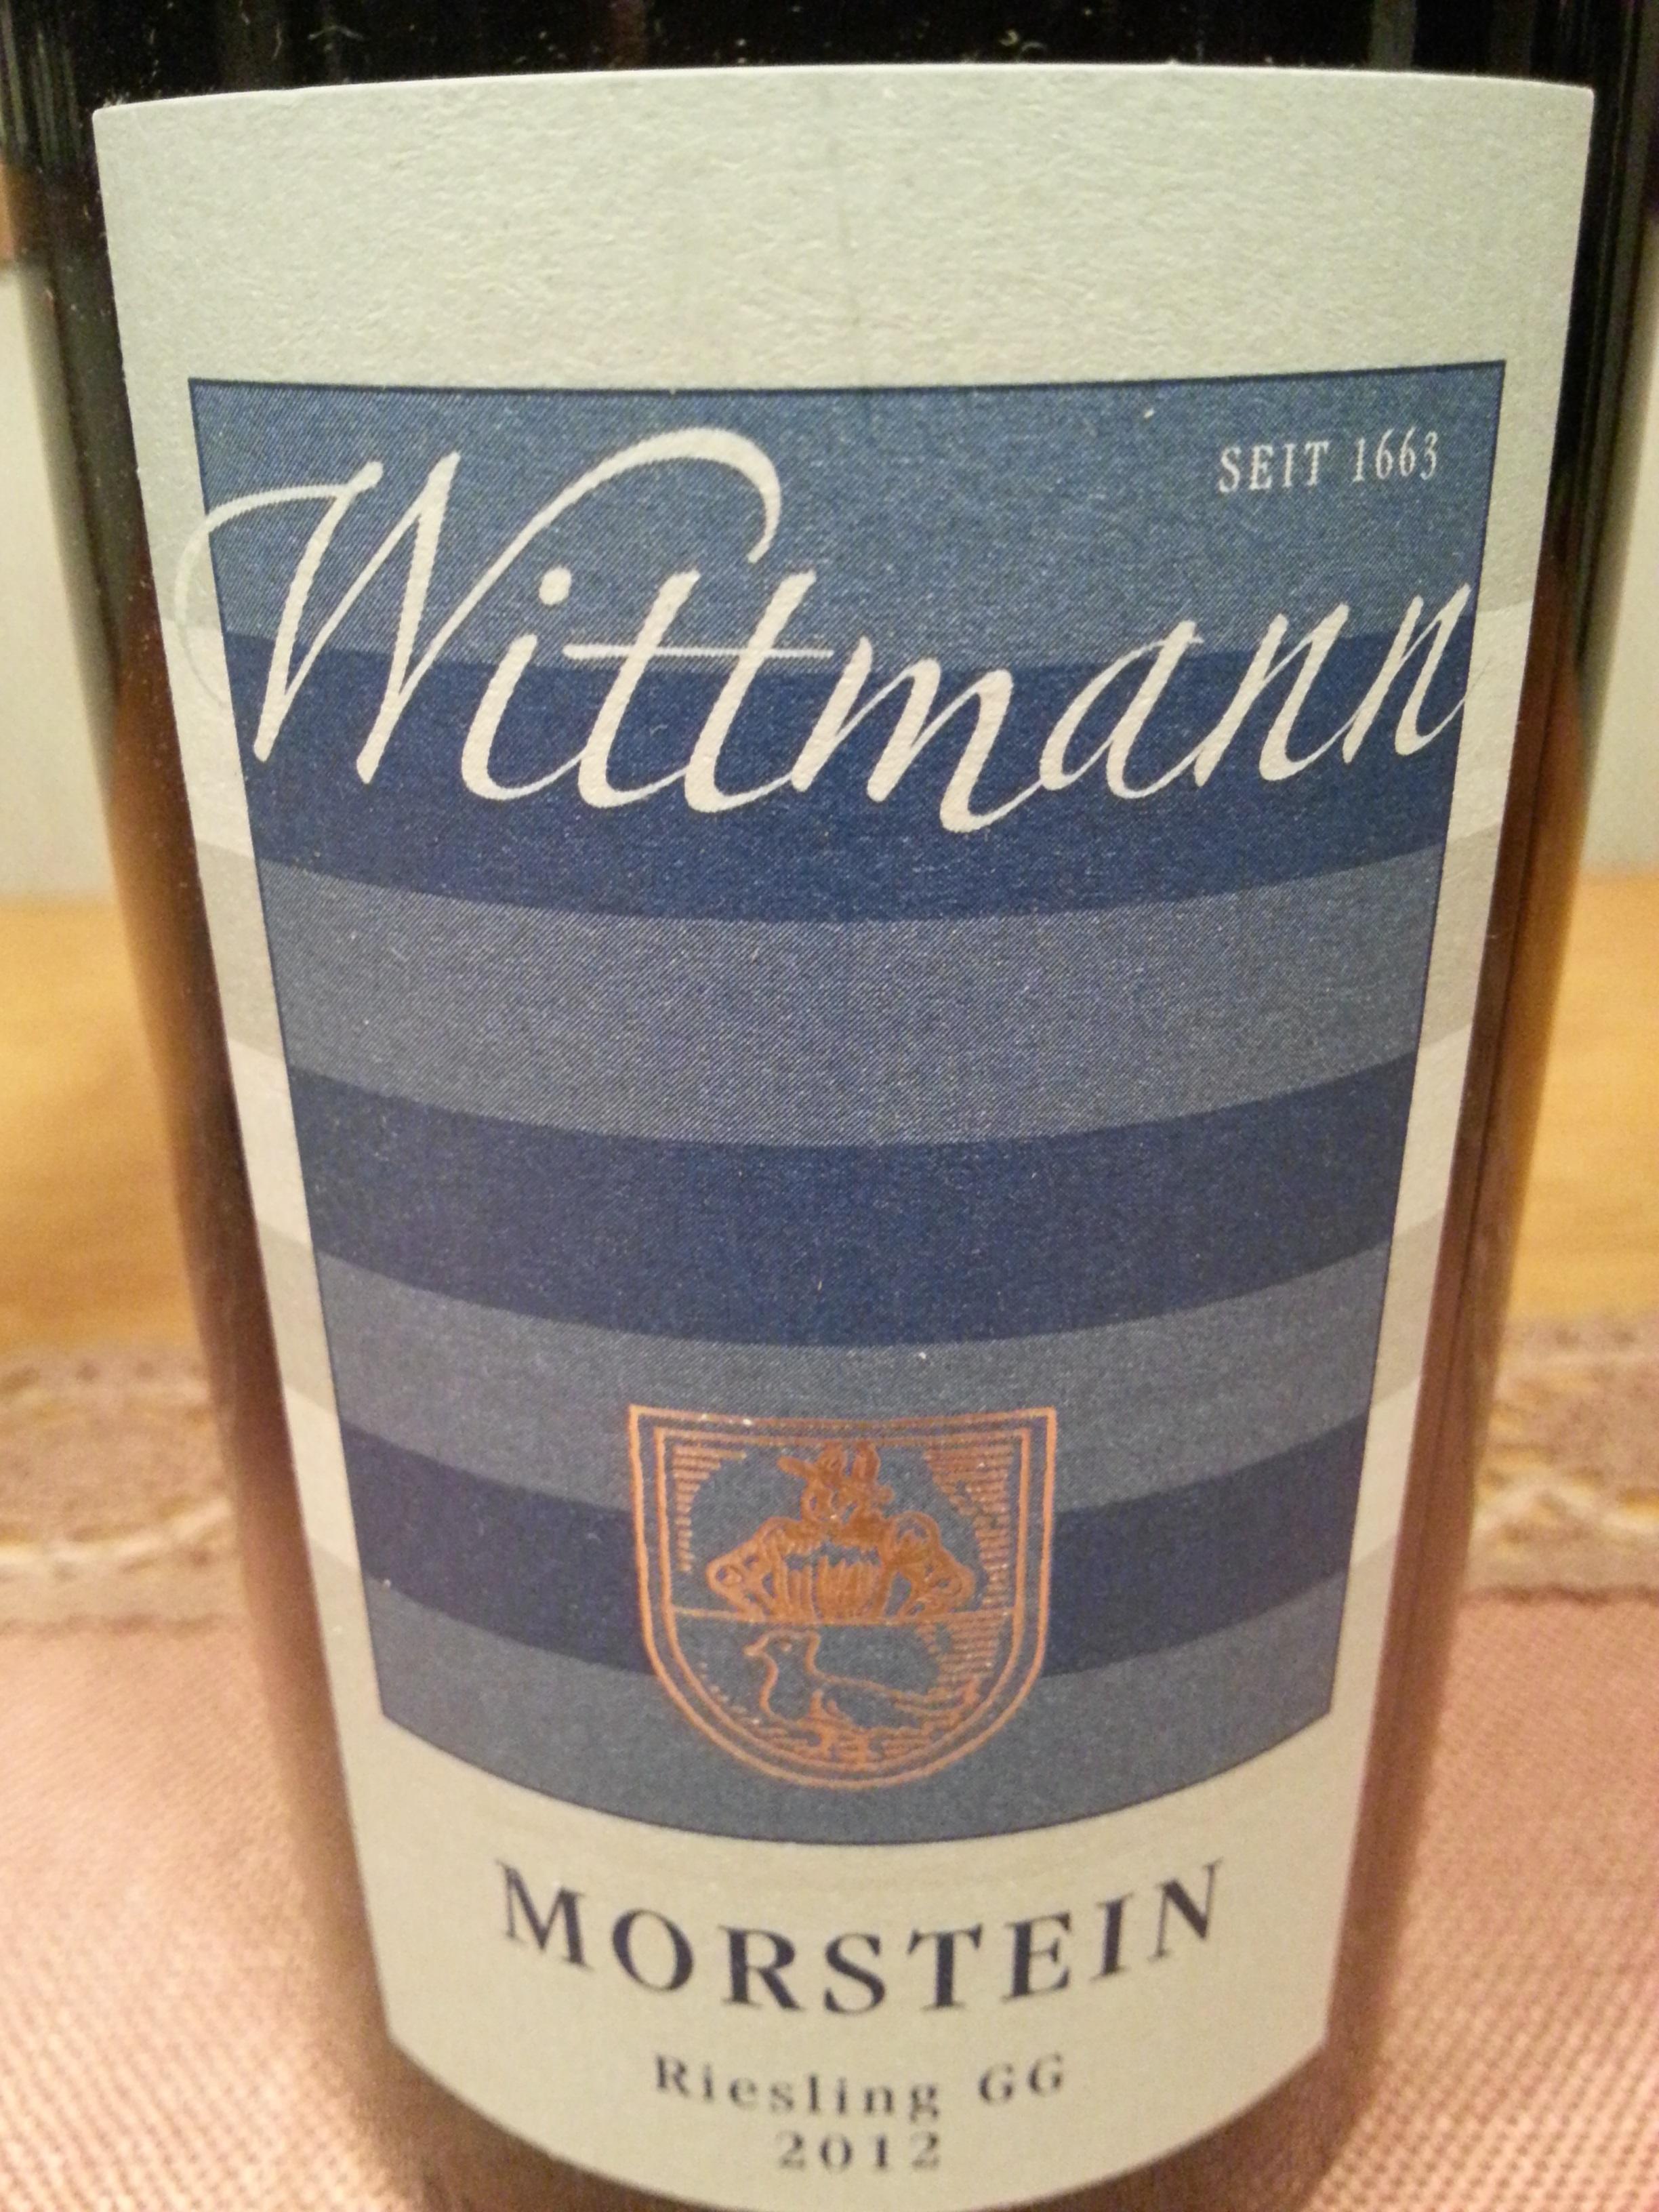 2012 Riesling Morstein GG | Wittmann